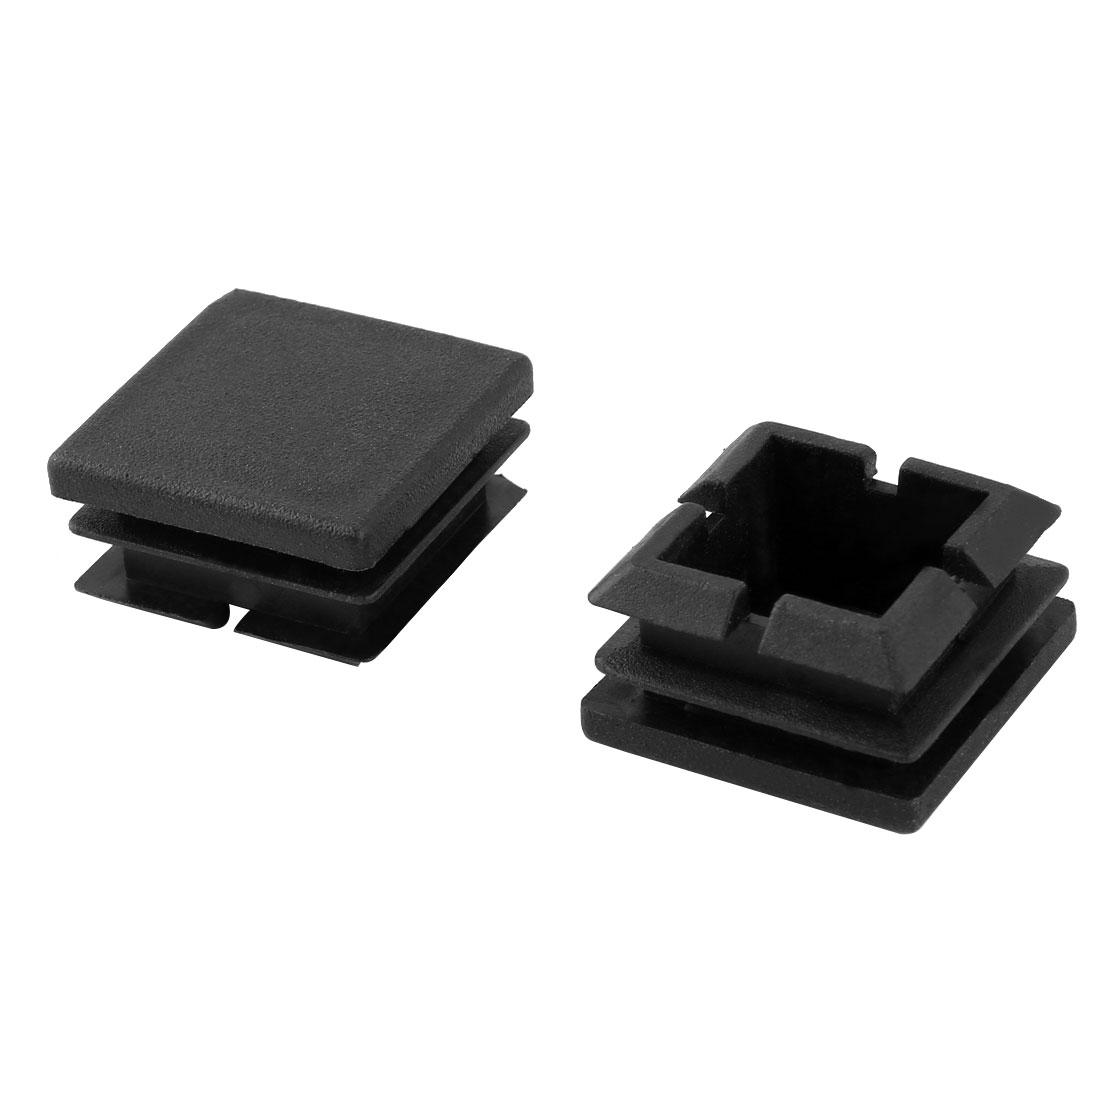 2 Pcs 25mm x 25mm Plastic Blanking End Caps Cover Square Tubing Tube Insert Black